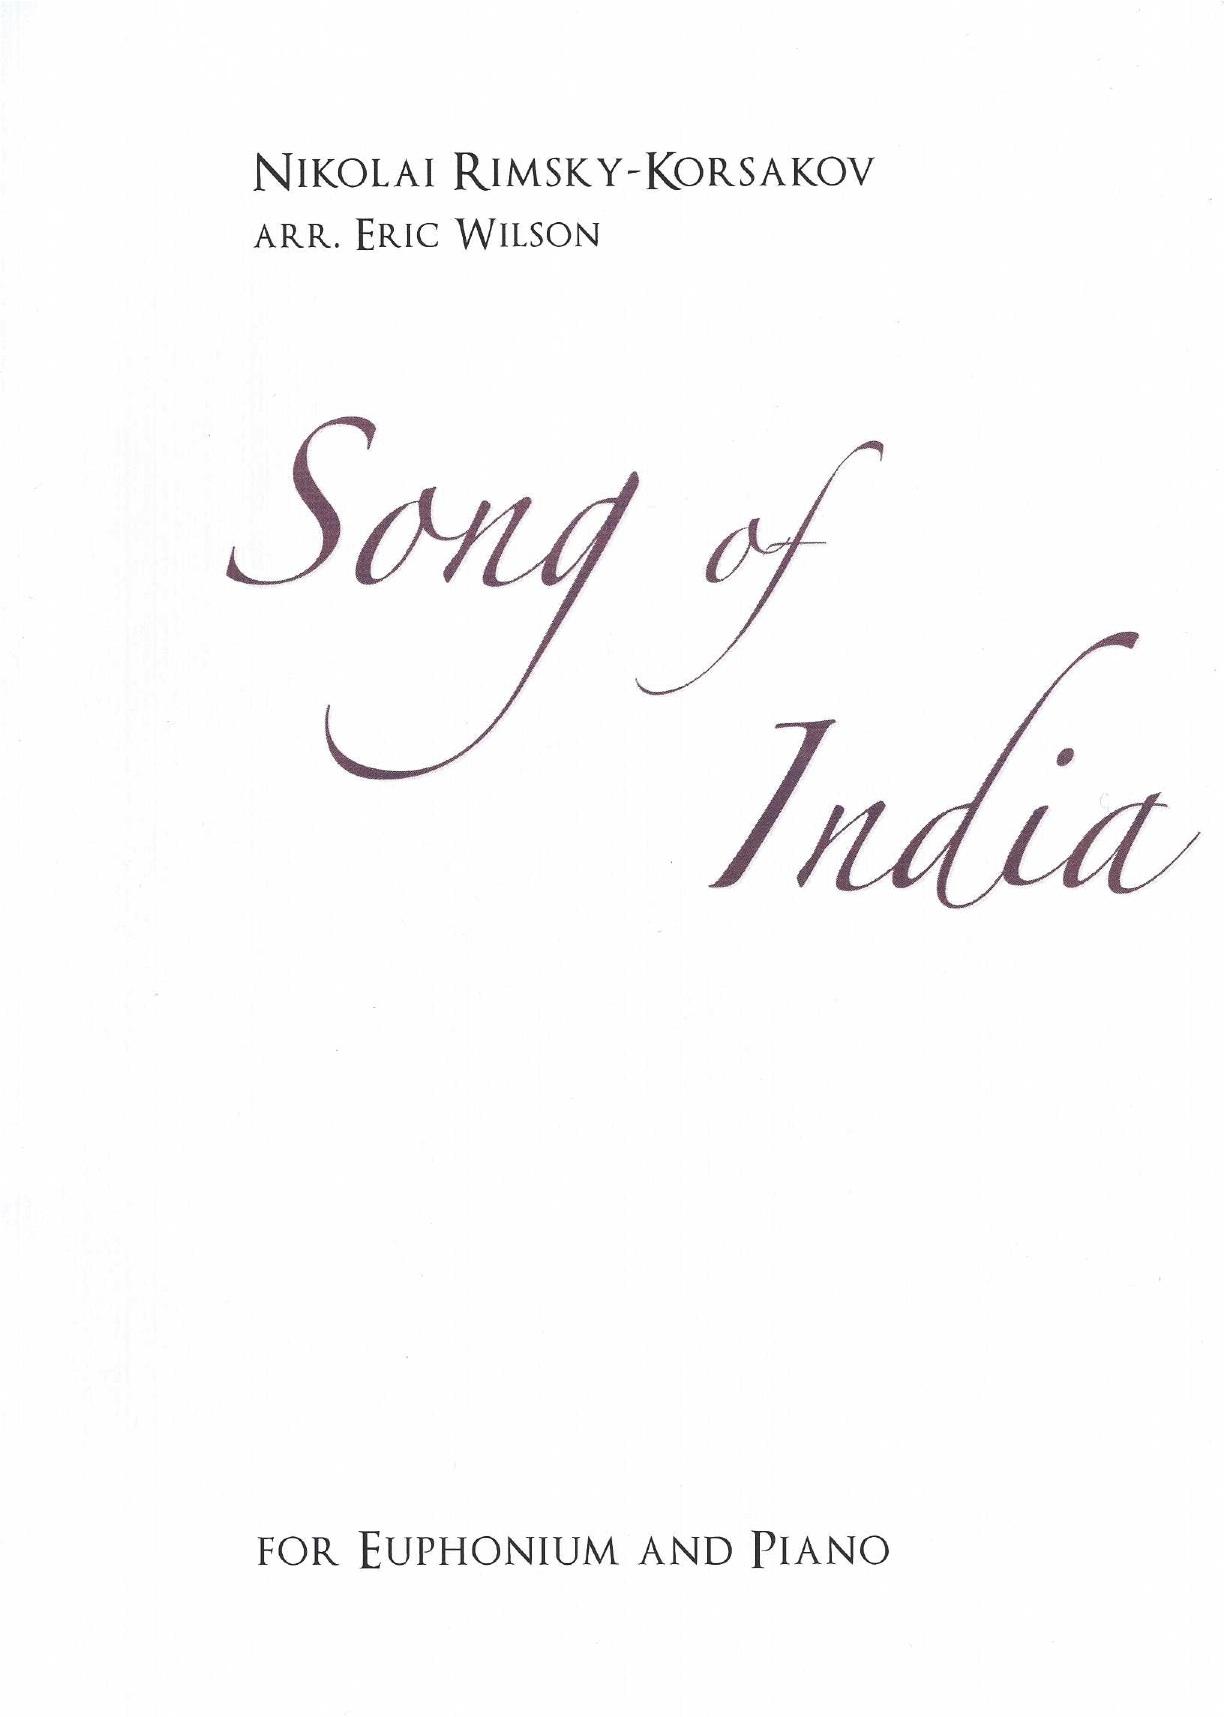 Song of India - Rimsky Korsakov Arr.E.Wilson - Euphonium and Piano